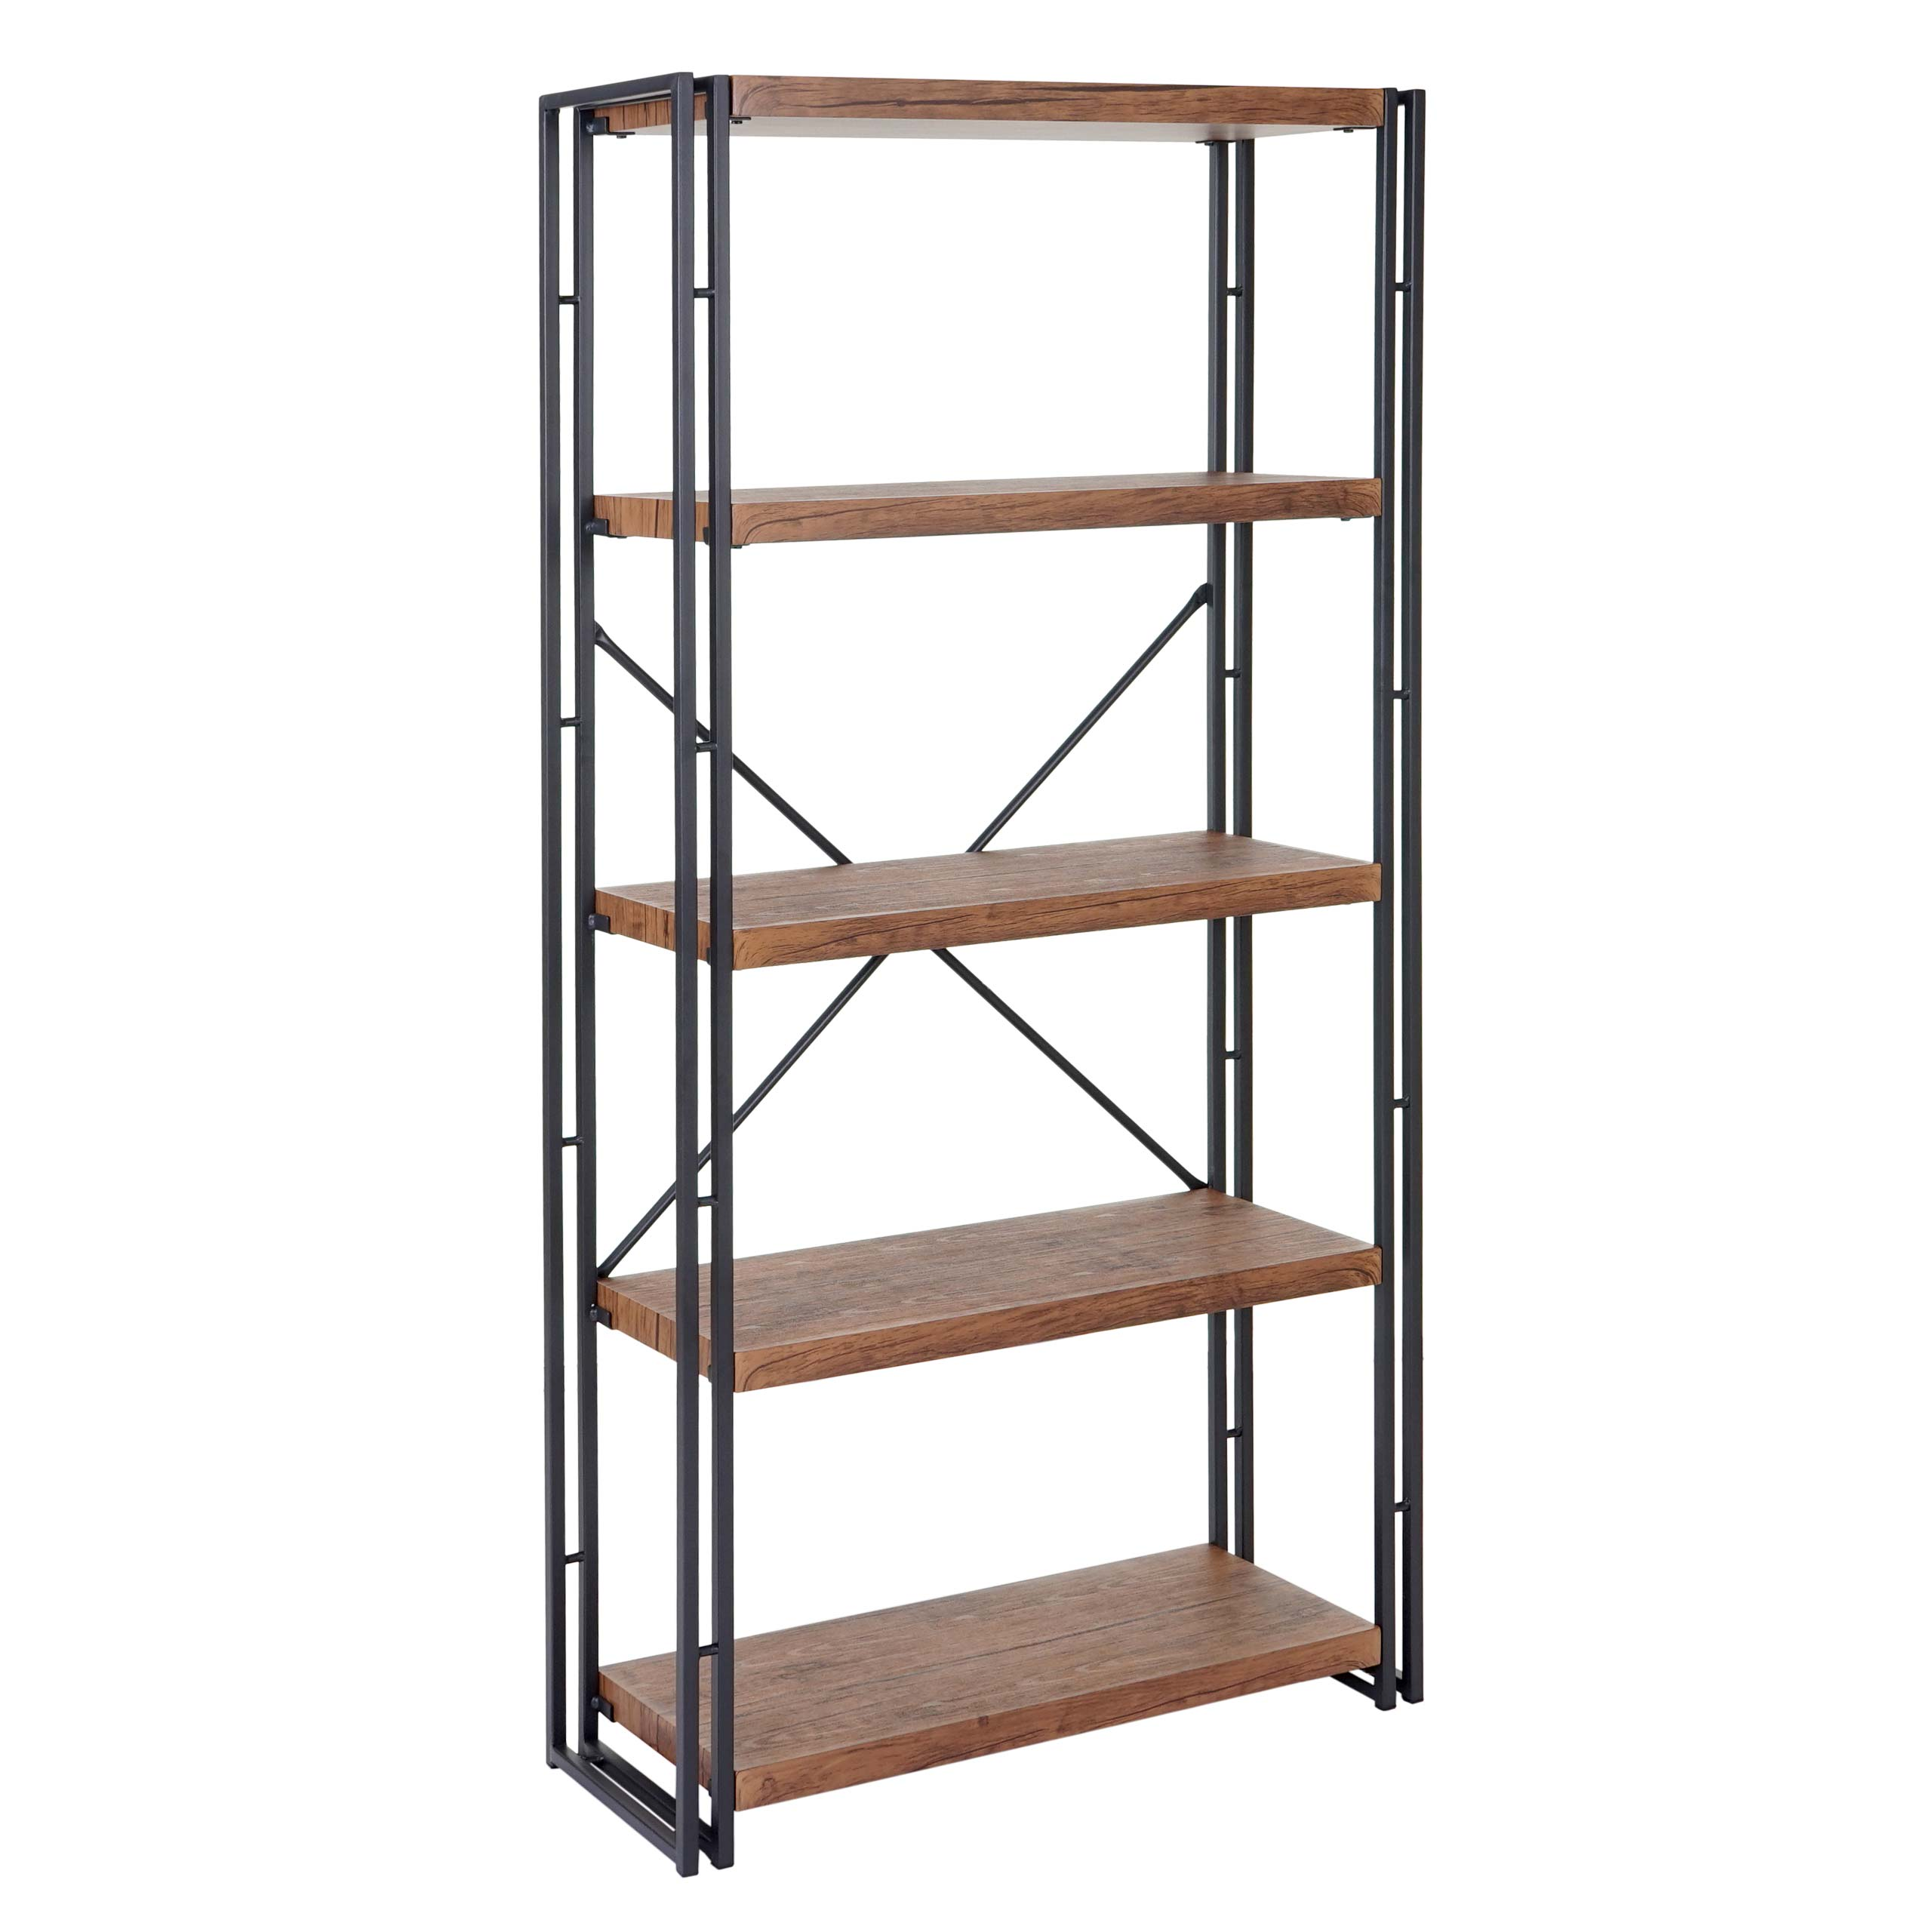 b cherregal hwc a27 standregal wohnregal 3d struktur. Black Bedroom Furniture Sets. Home Design Ideas